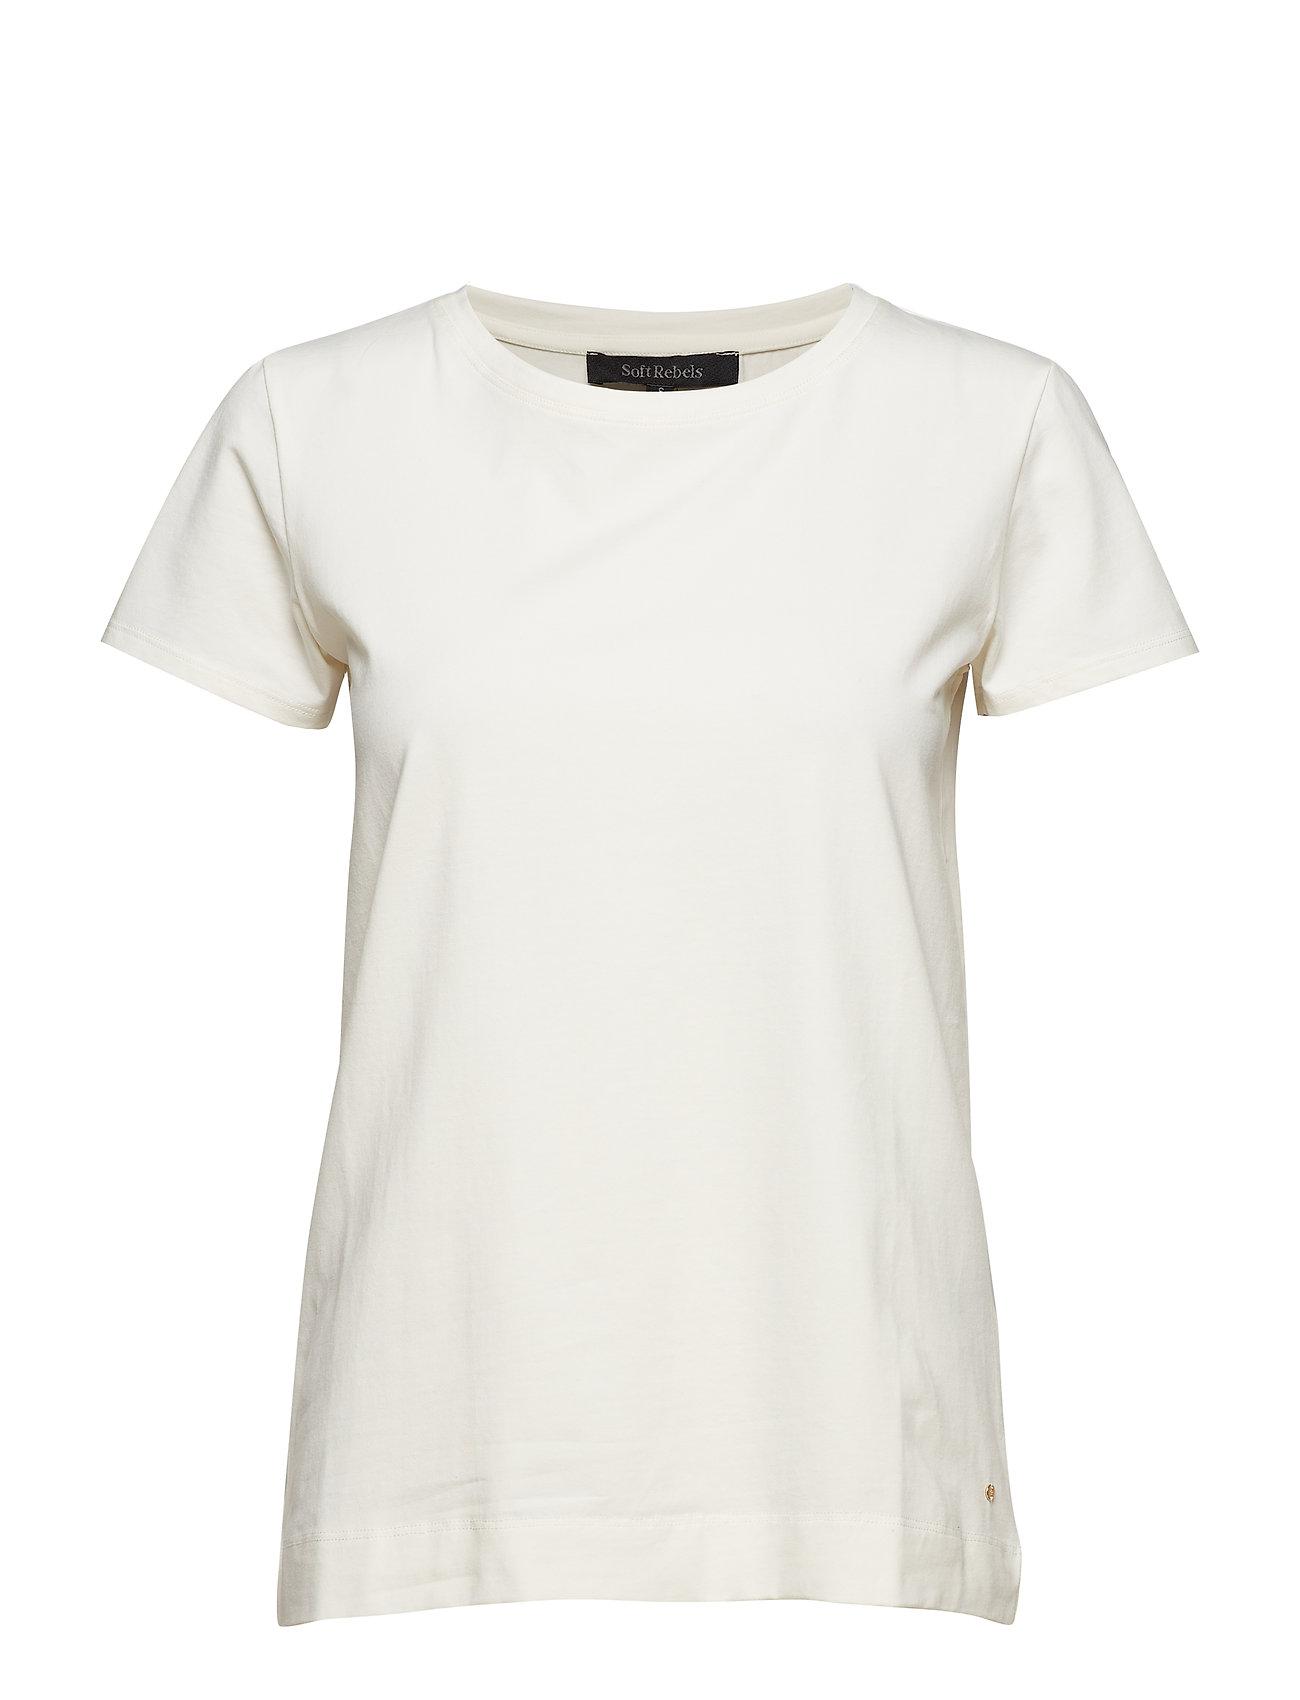 Soft Rebels Elle T-shirt - SNOW WHITE / OFF WHITE